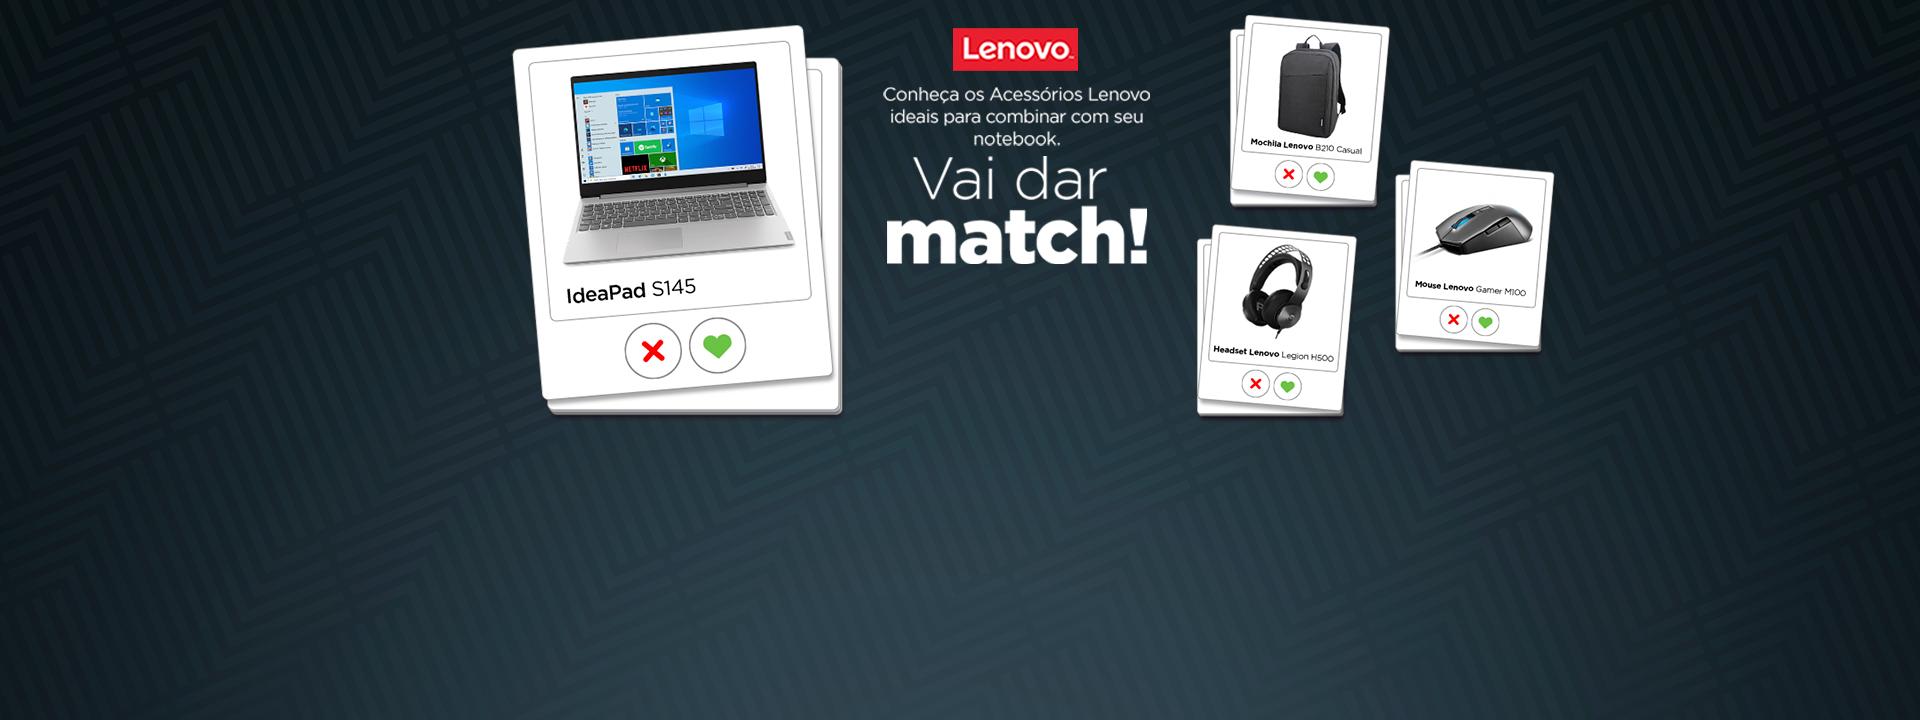 Acessórios Lenovo